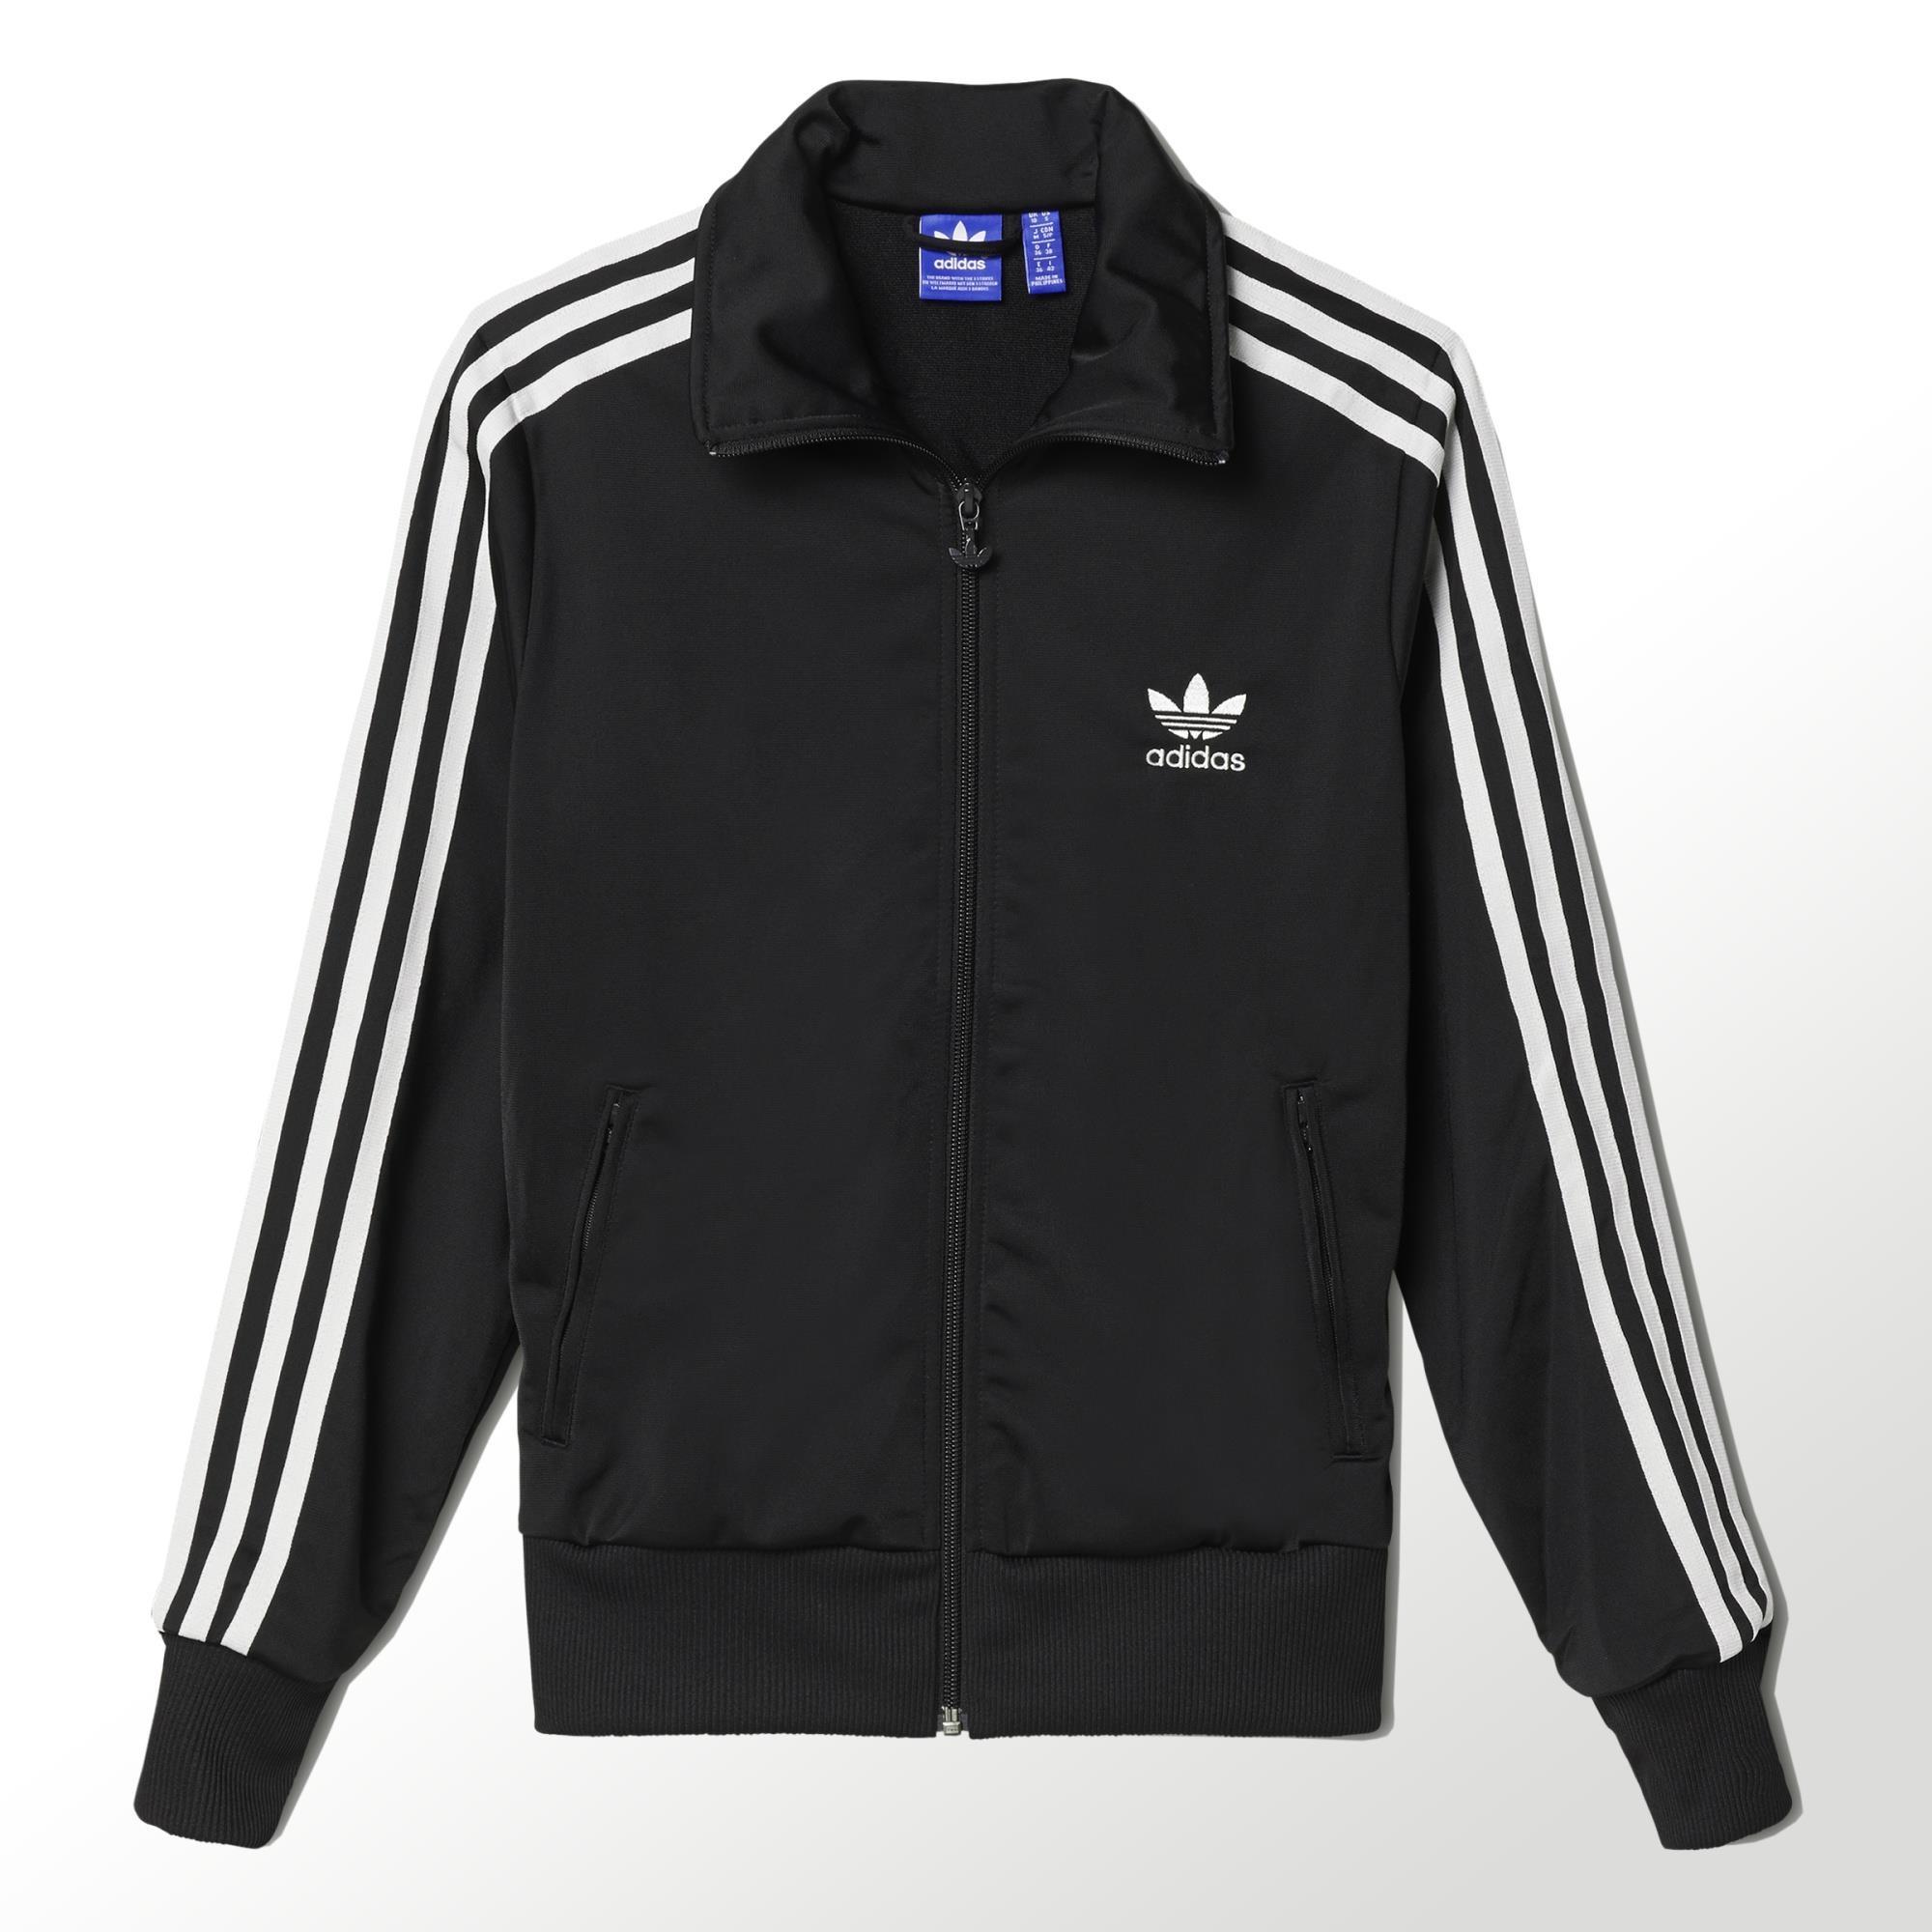 Adidas firebird trainingsjack